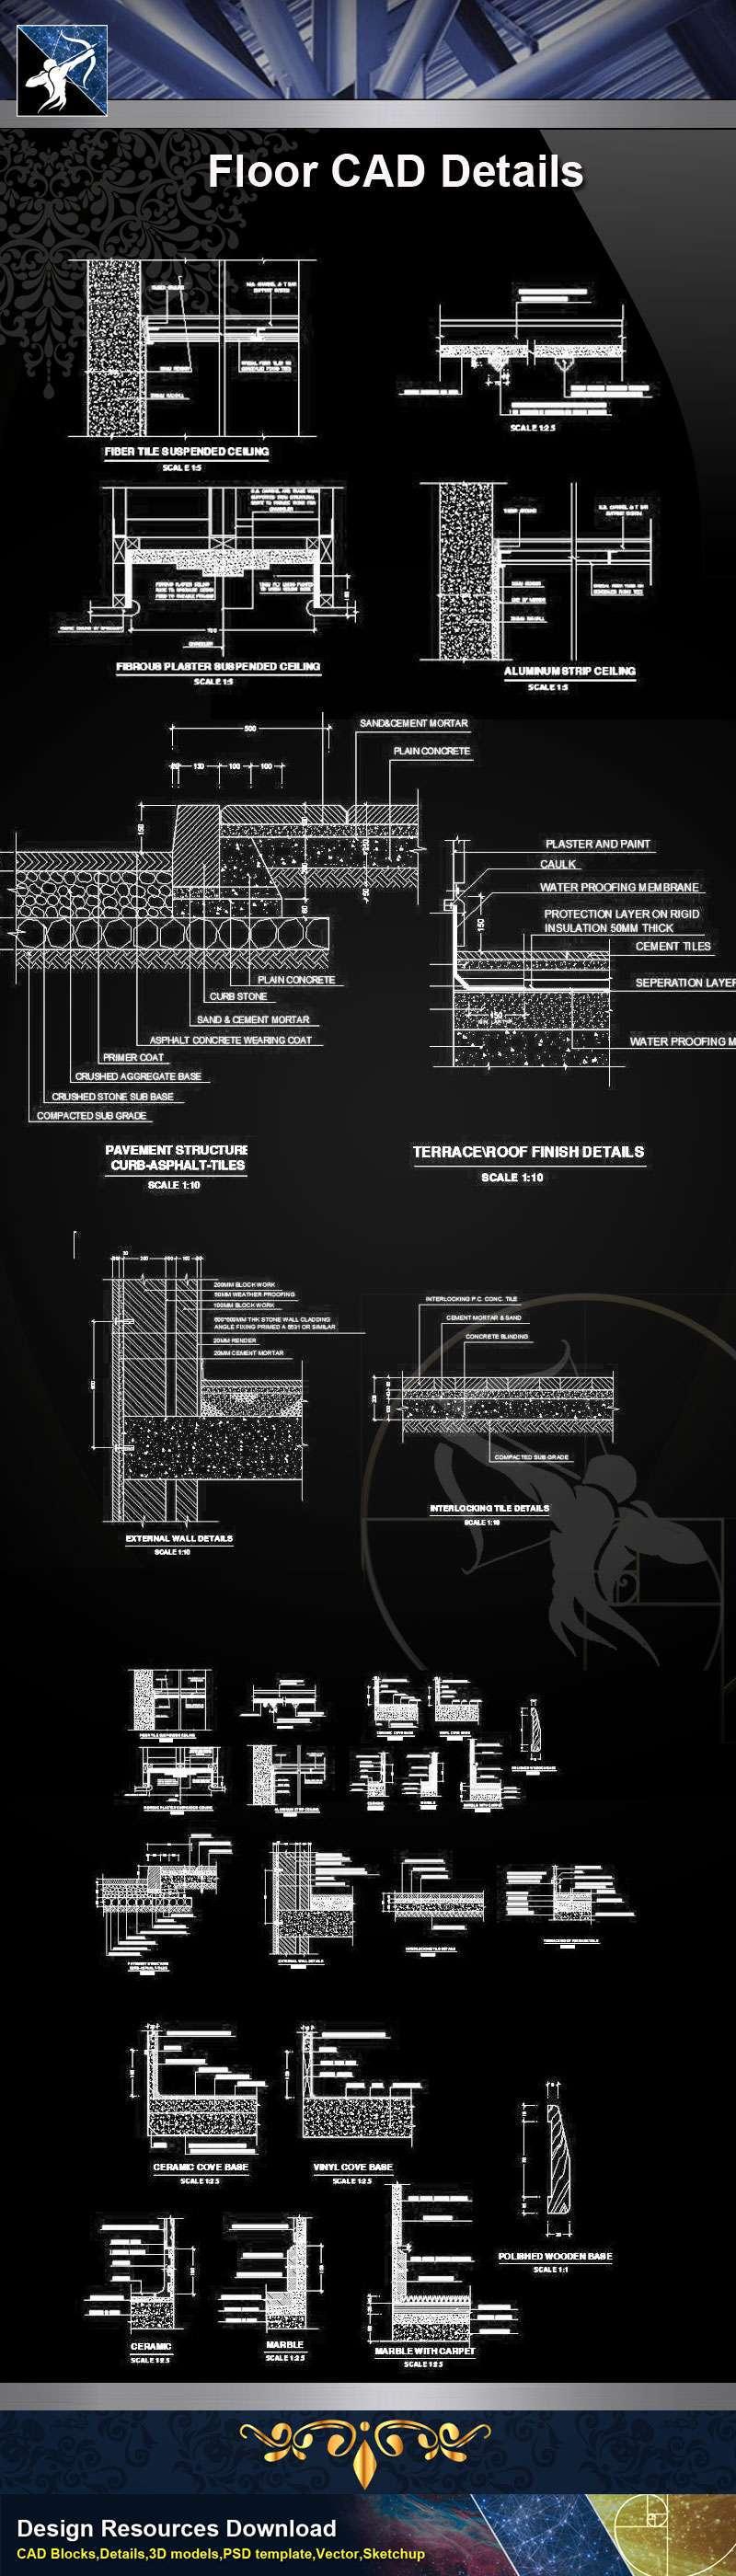 【Architecture CAD Details Collections】Flooring CAD Details V.1